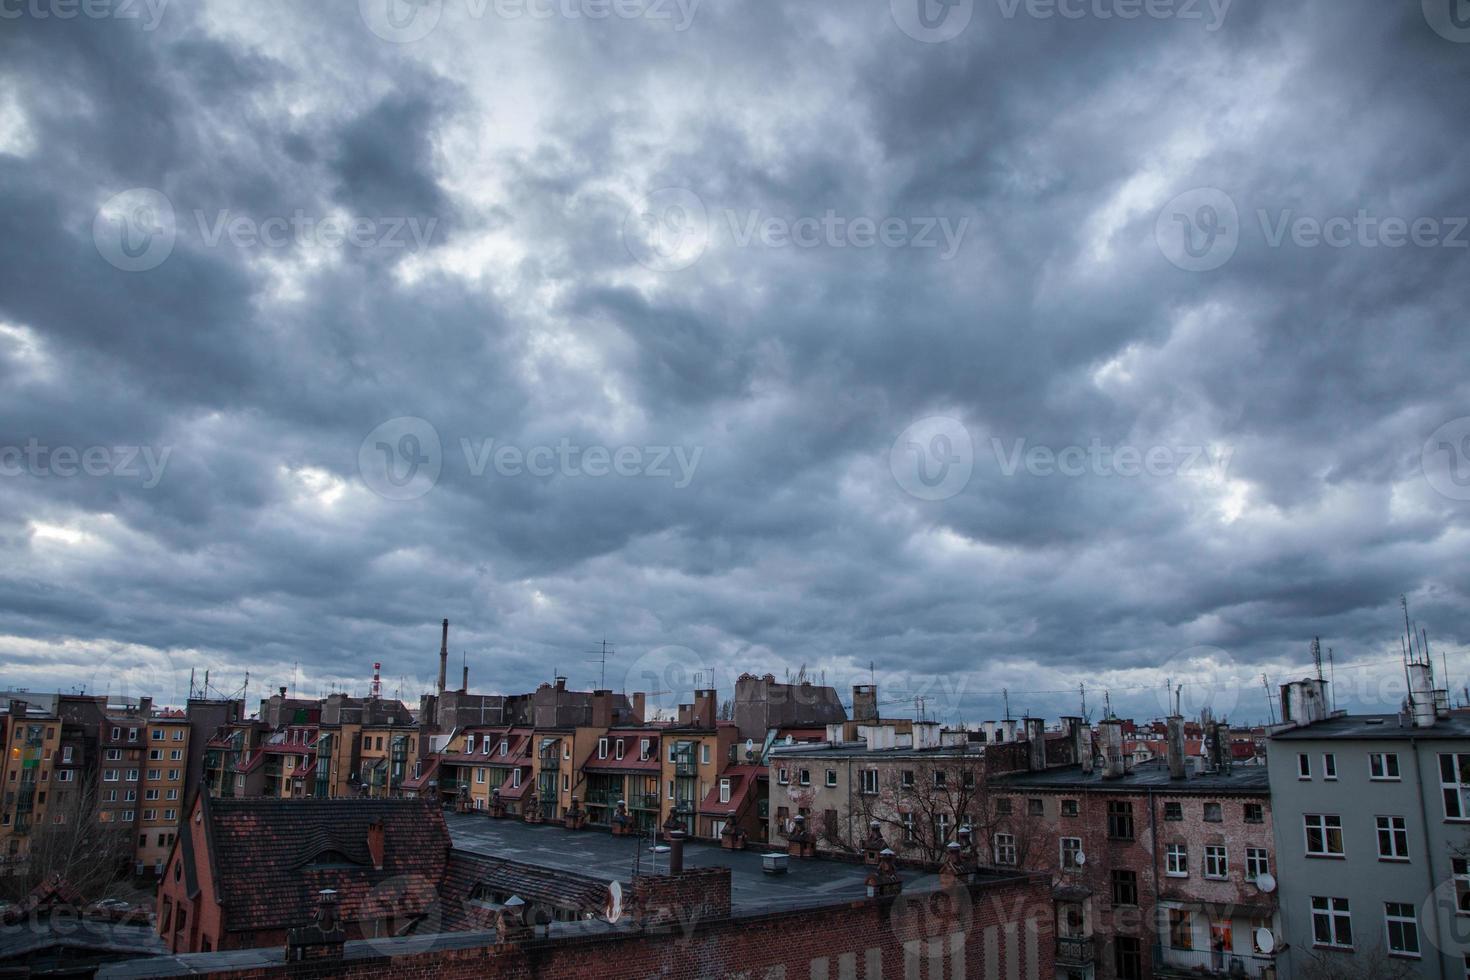 donkere lucht boven de stad foto